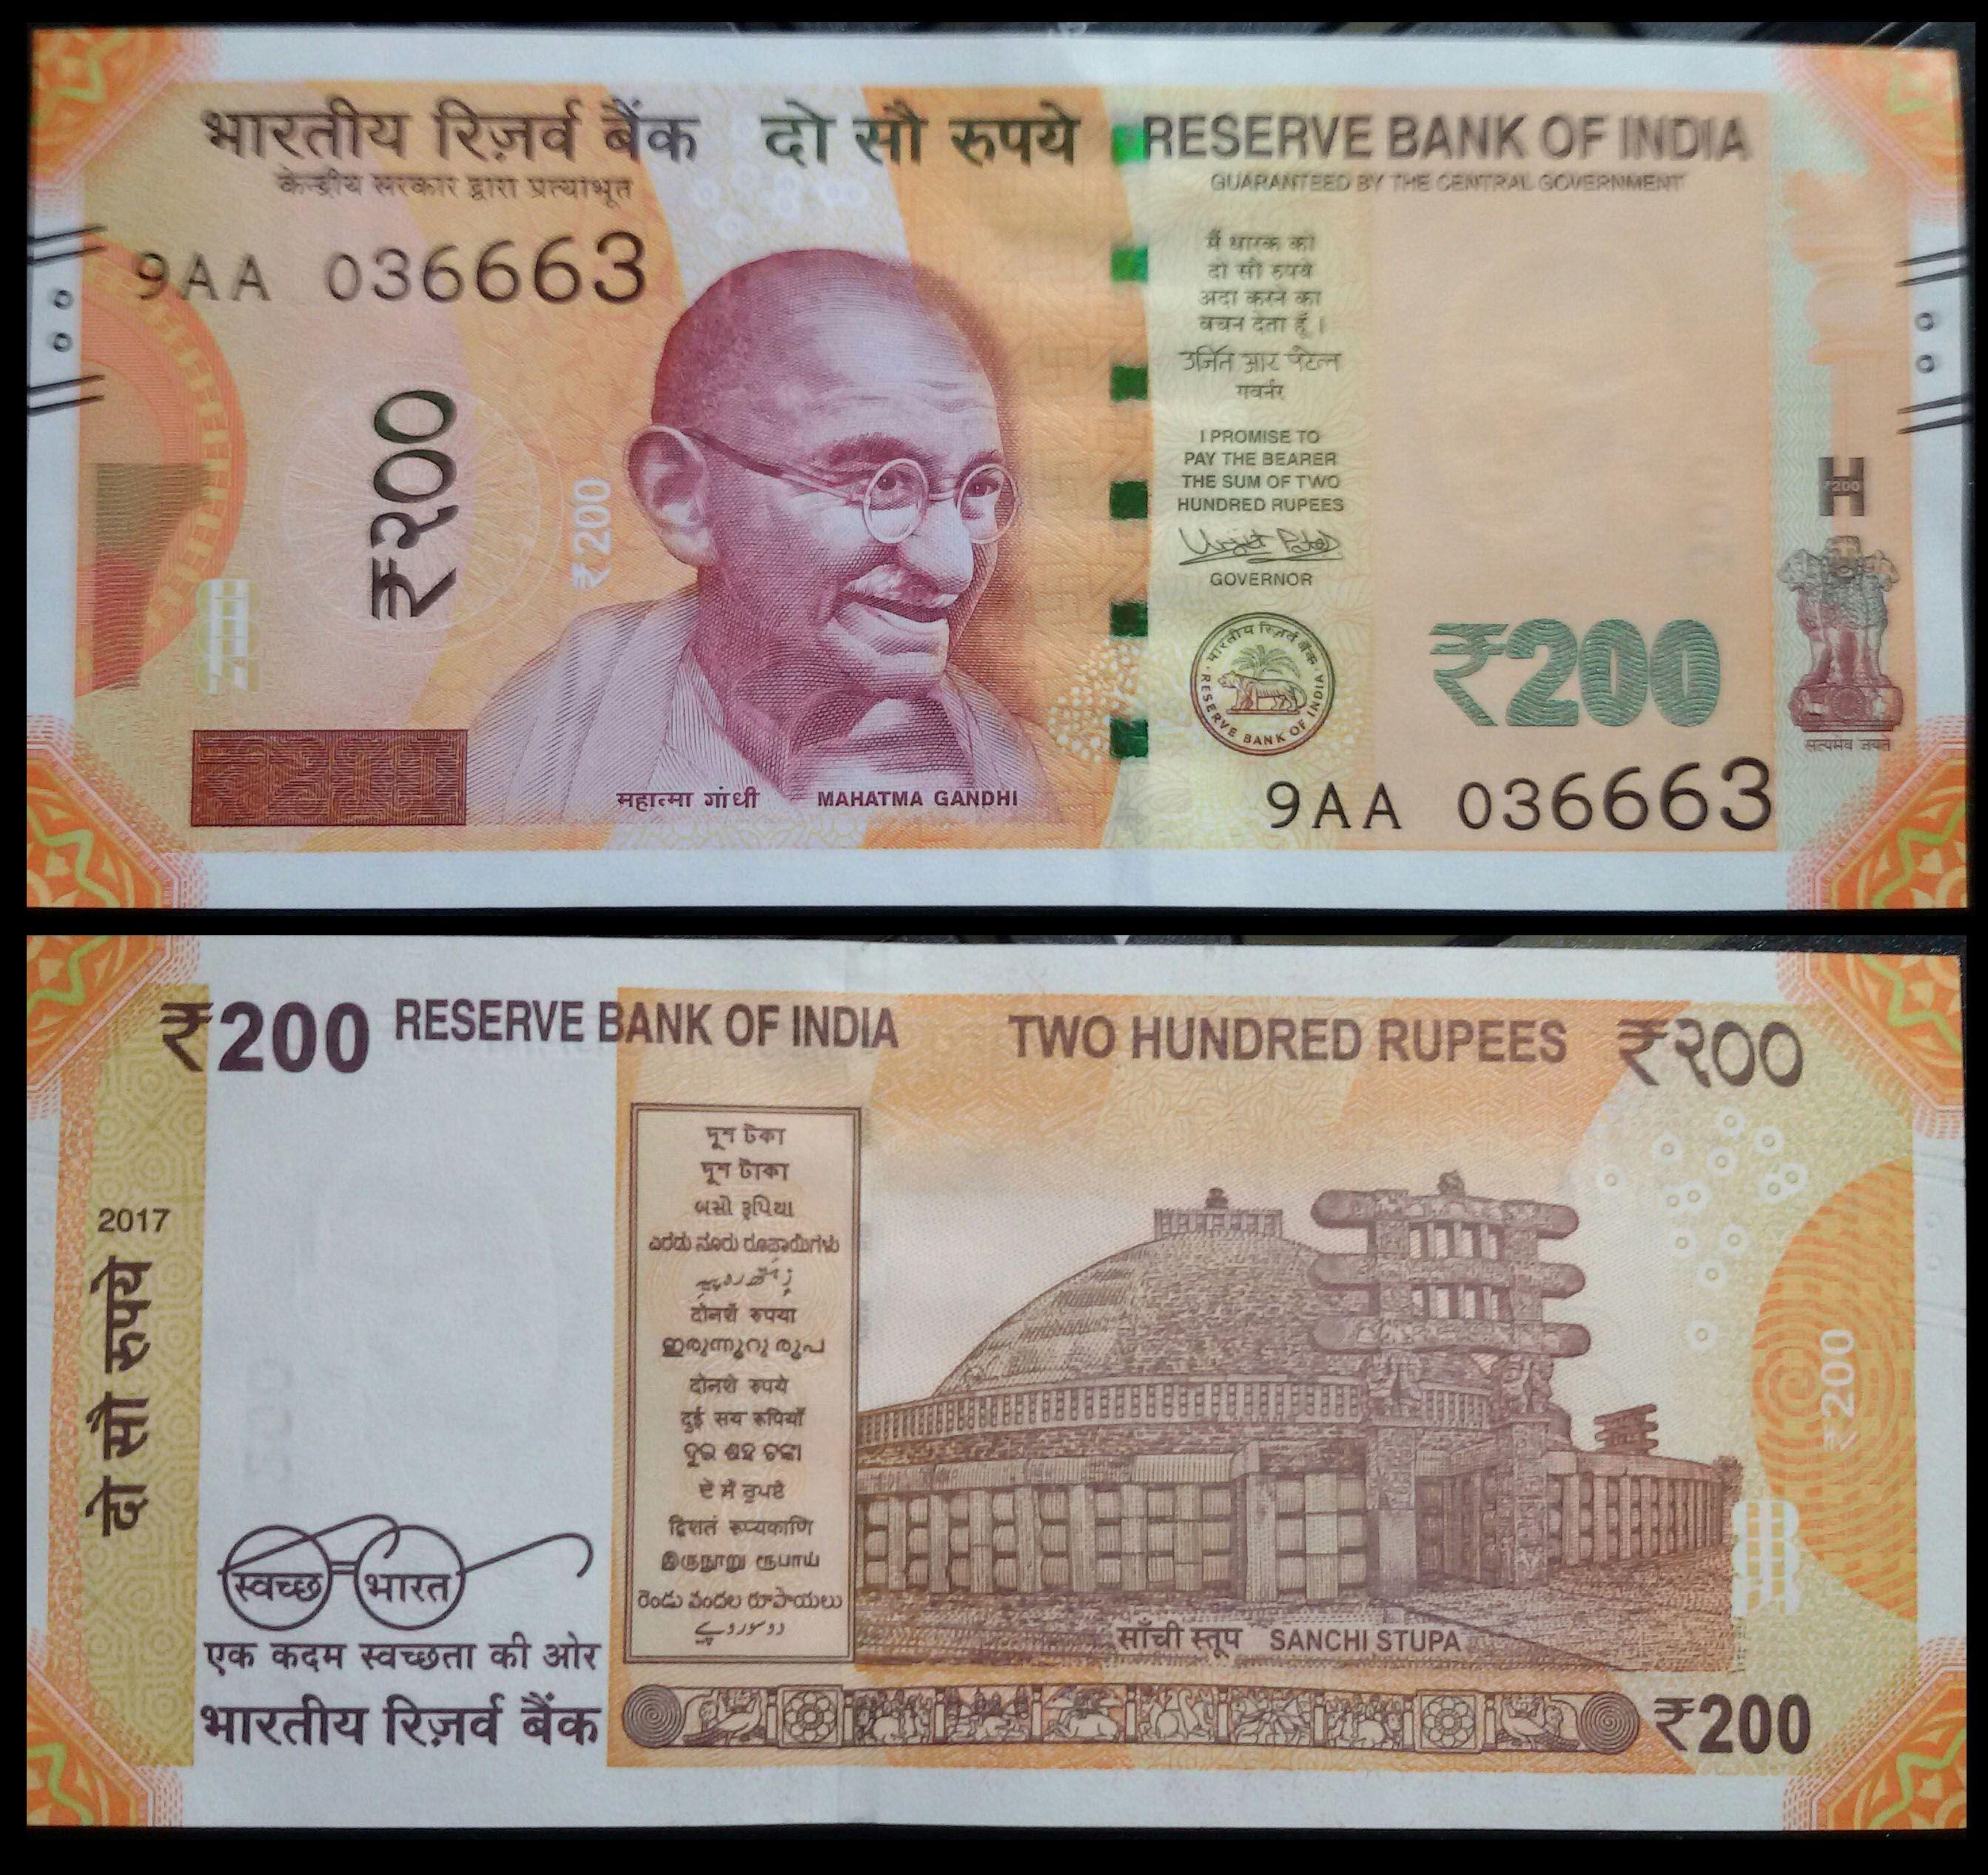 India | Banknotes | Bank of india, Money, News india